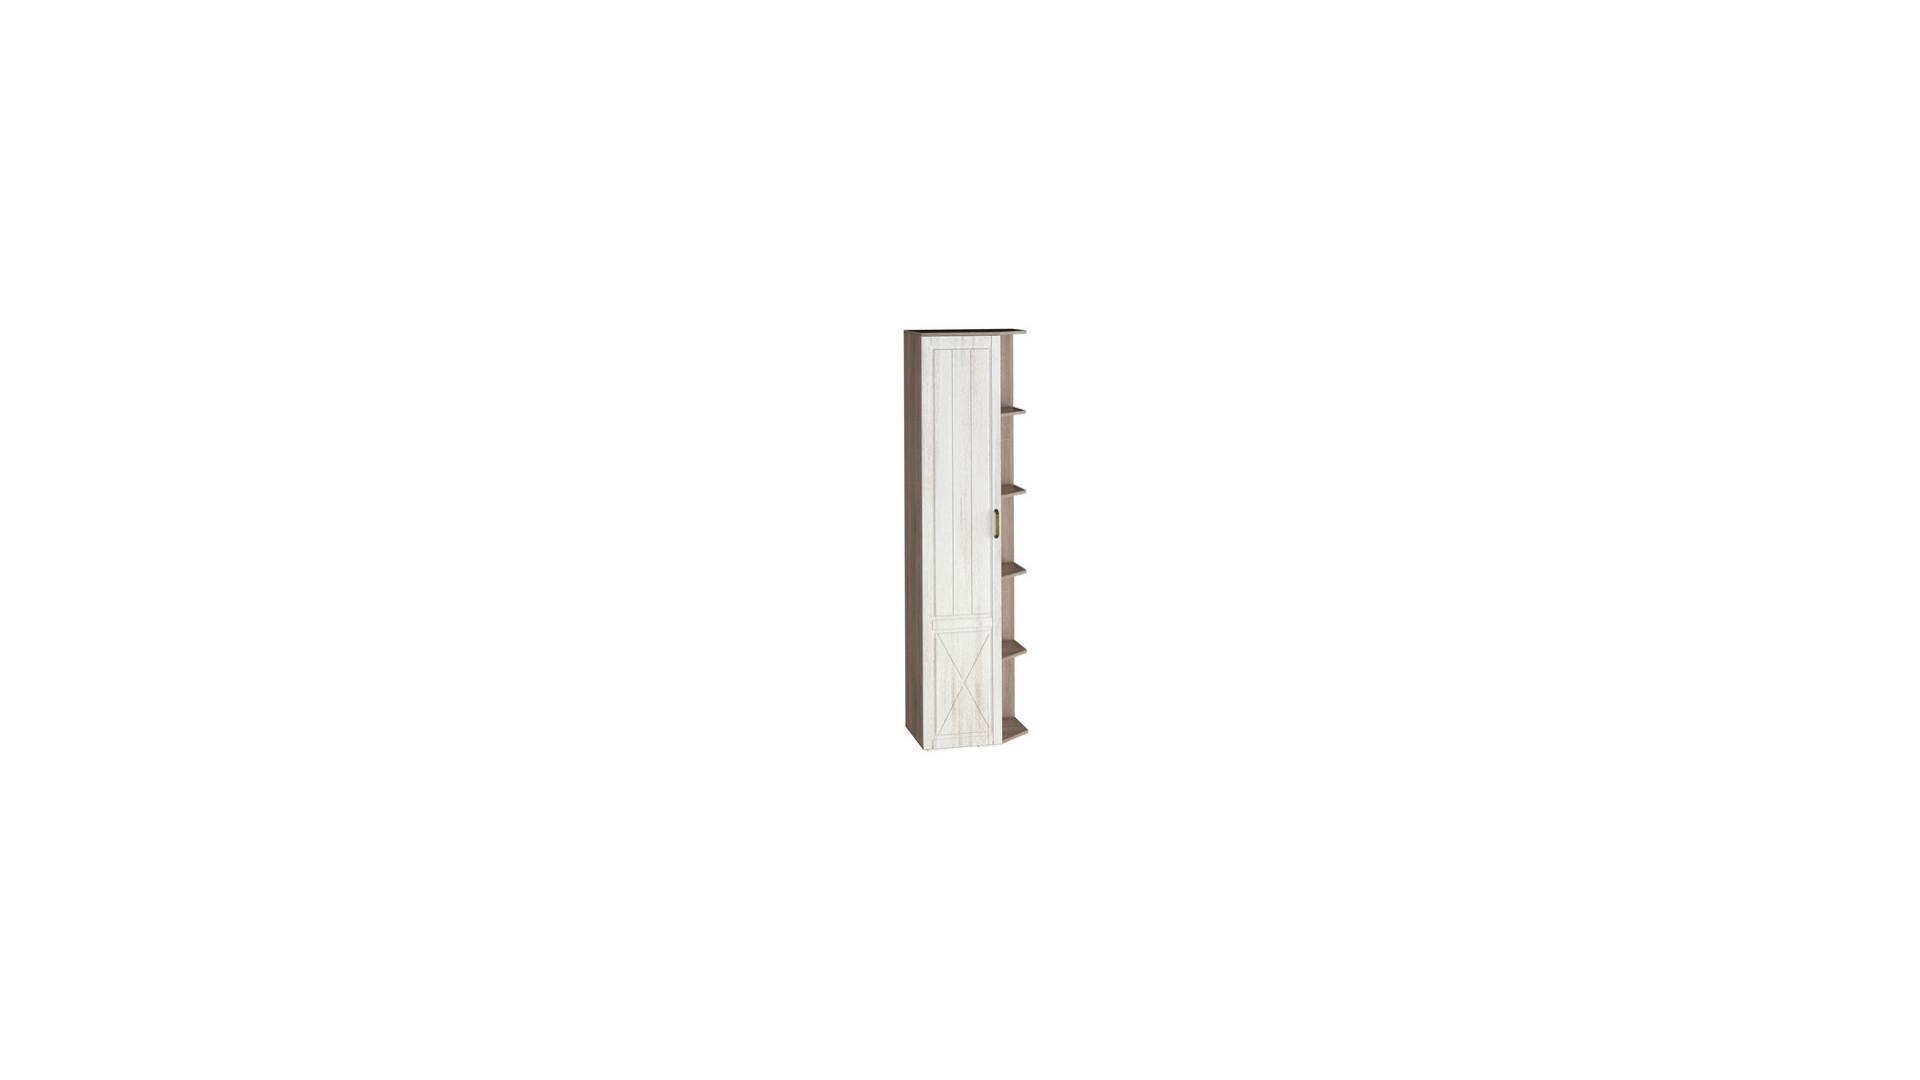 Шкаф-стеллаж левый Афина (540) Винтаж Оксид/Кантри